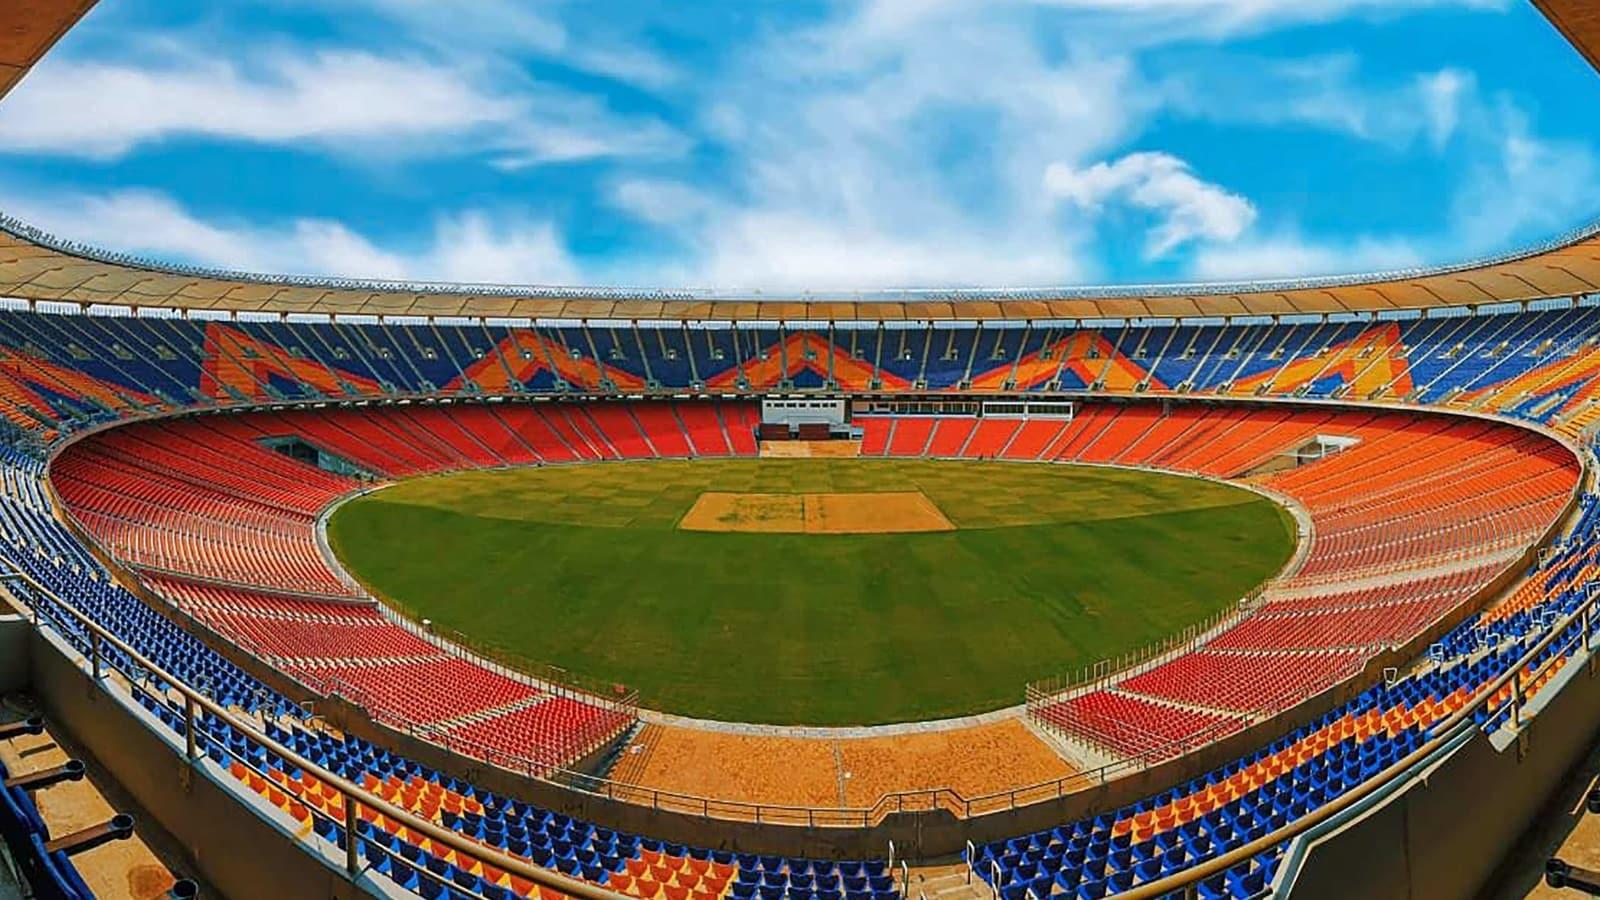 No question of renaming, Gujarat deputy CM clarifies on Motera stadium being named after PM Modi - Hindustan Times